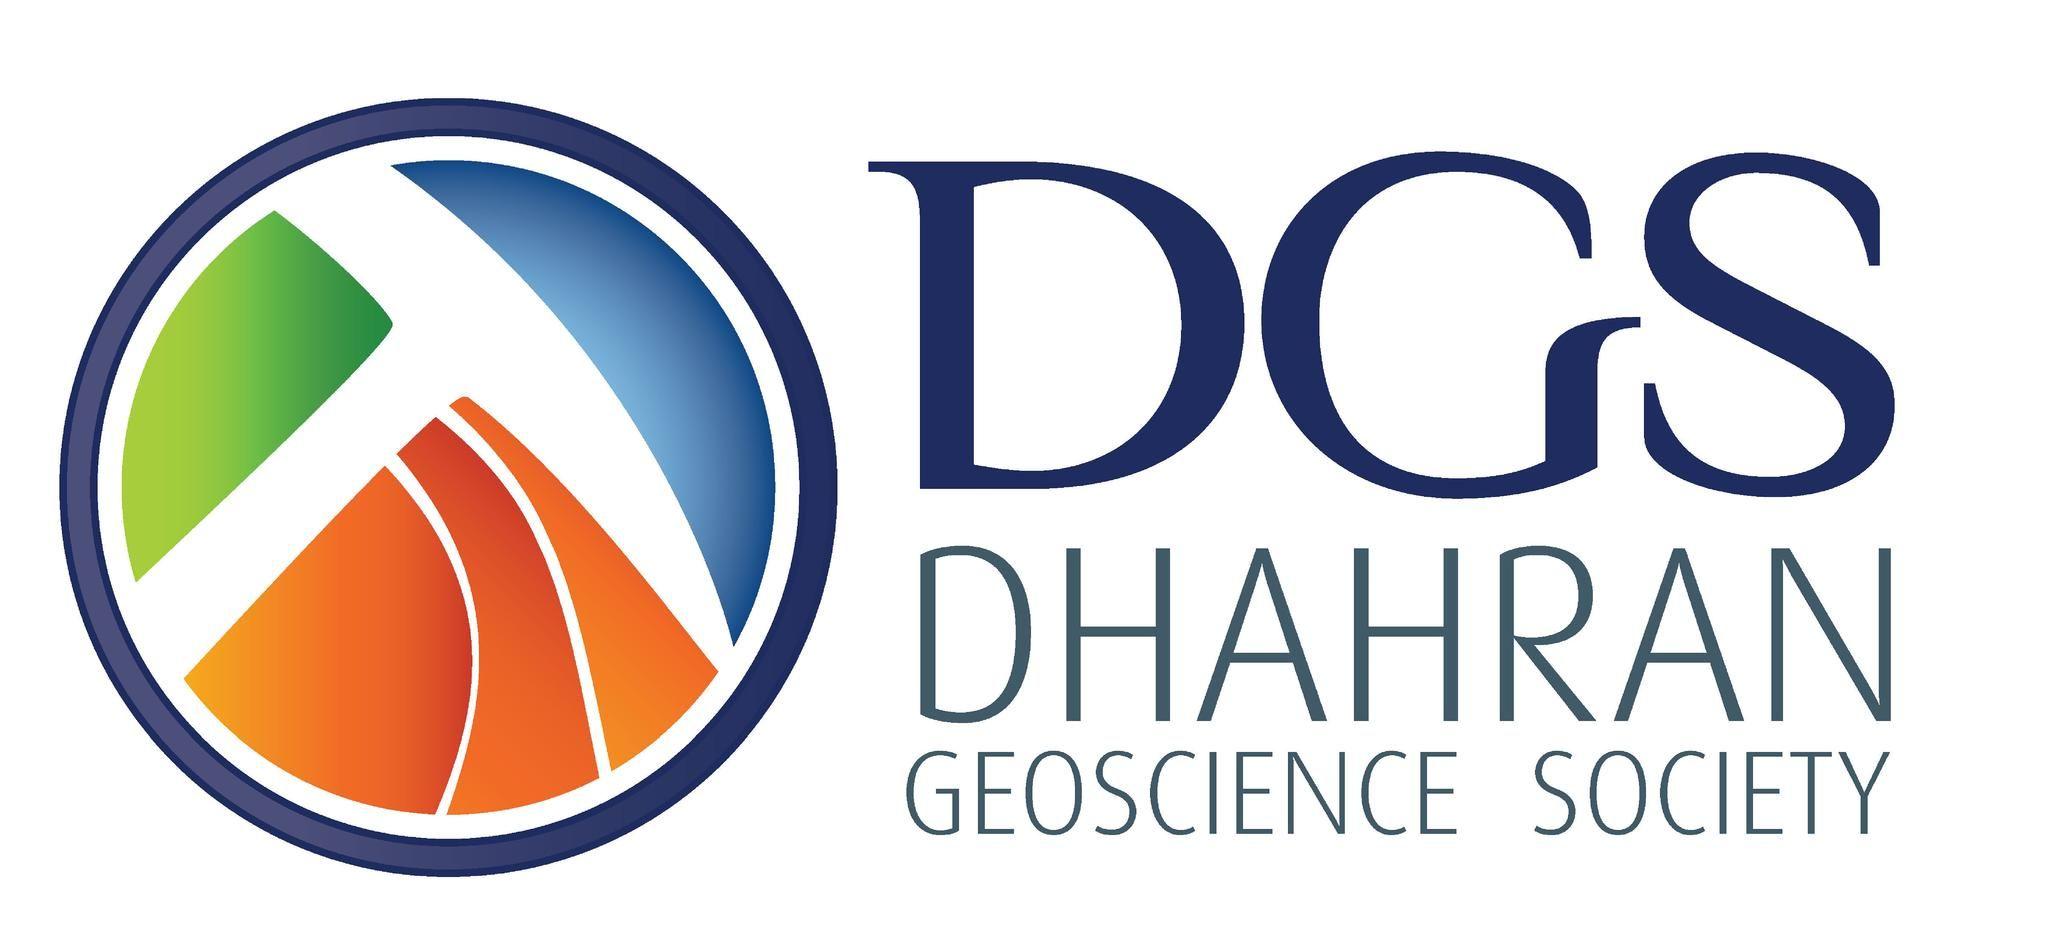 DHAHRAN GEOSCIENCE SOCIETY (DGS)